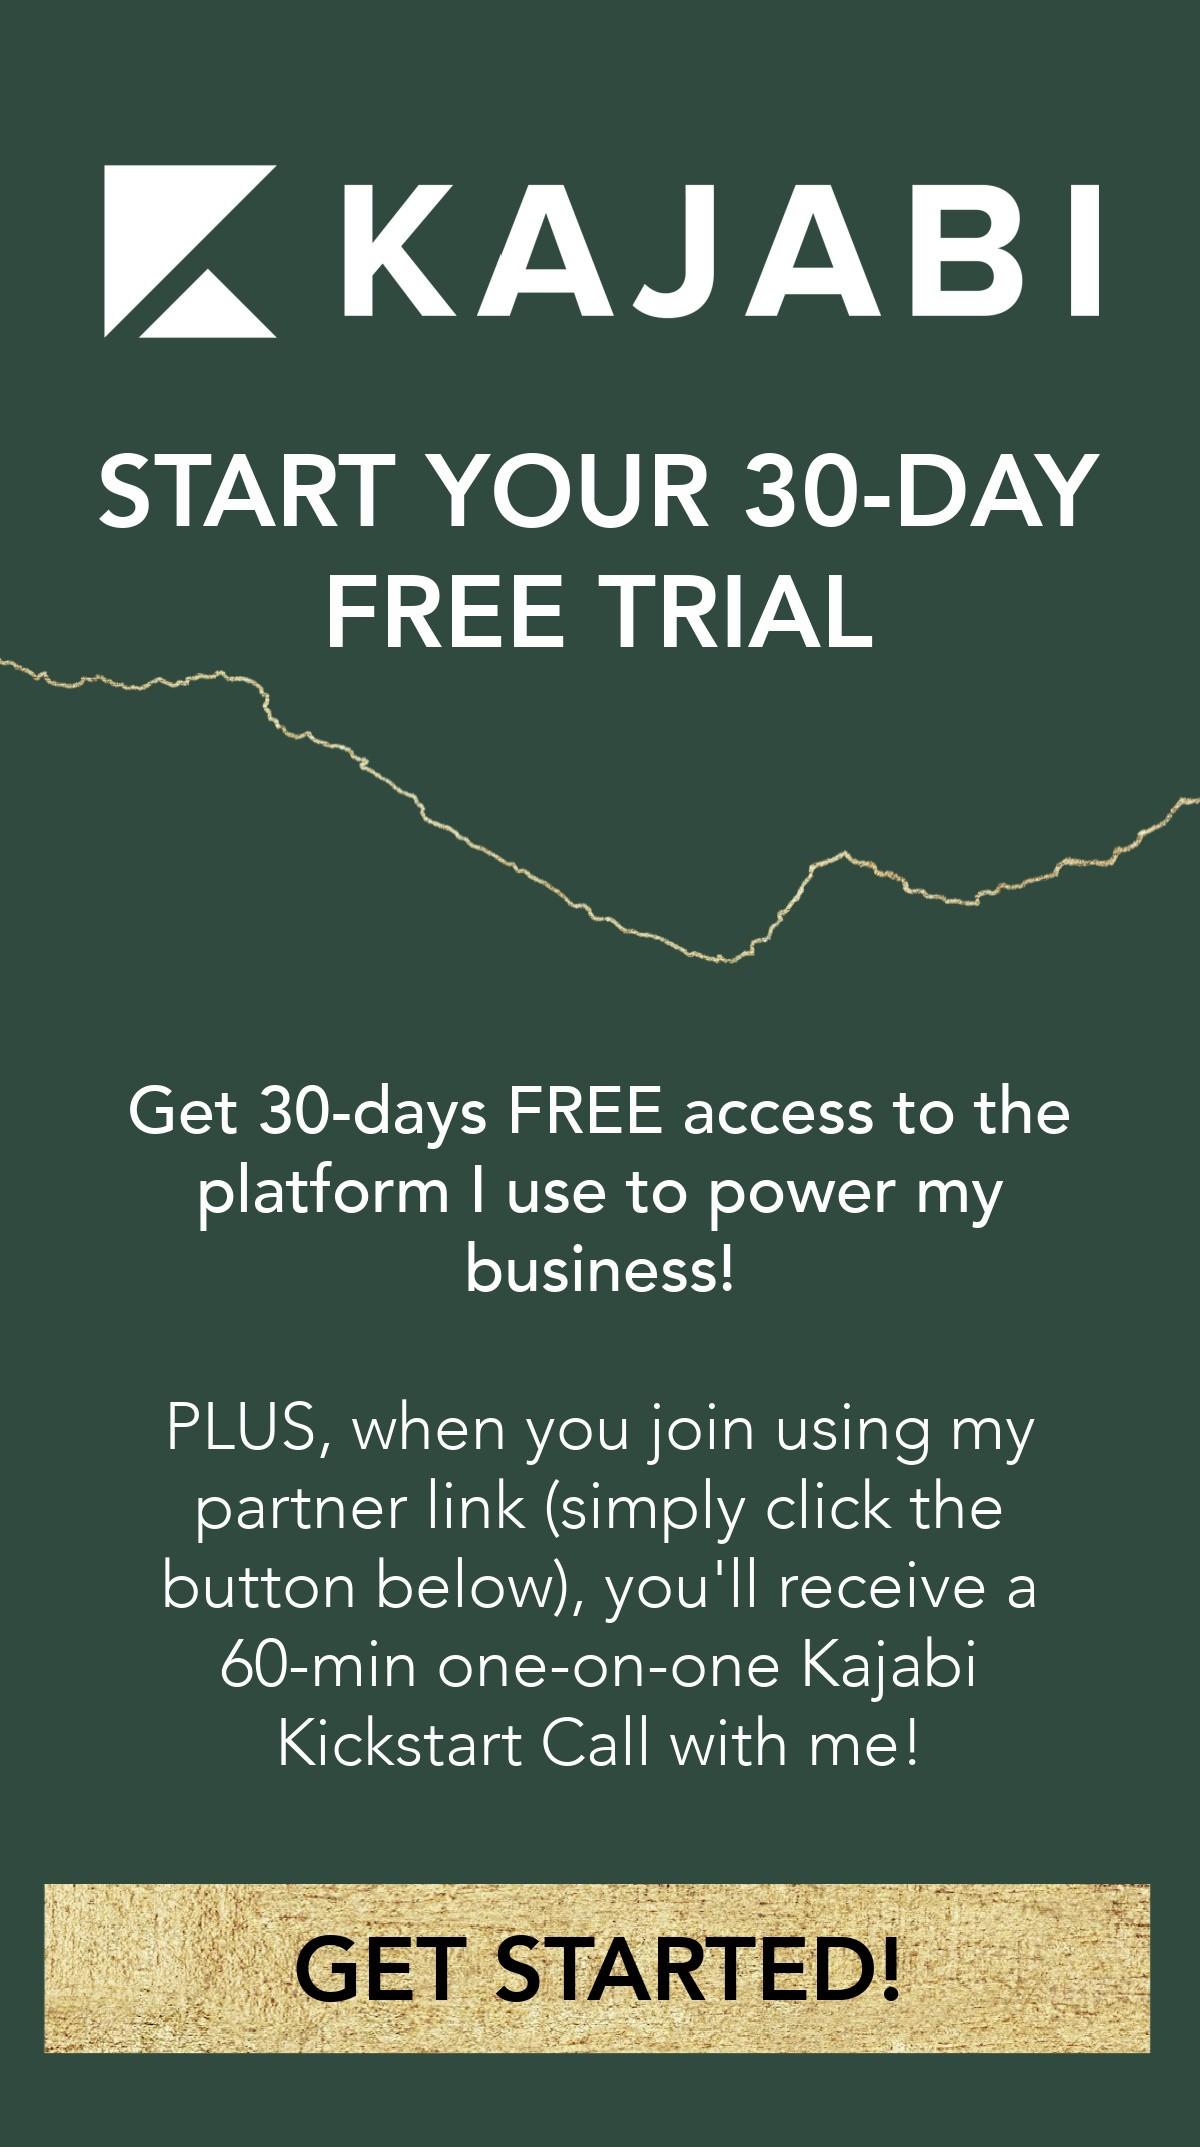 Kajabi 30-day free trial